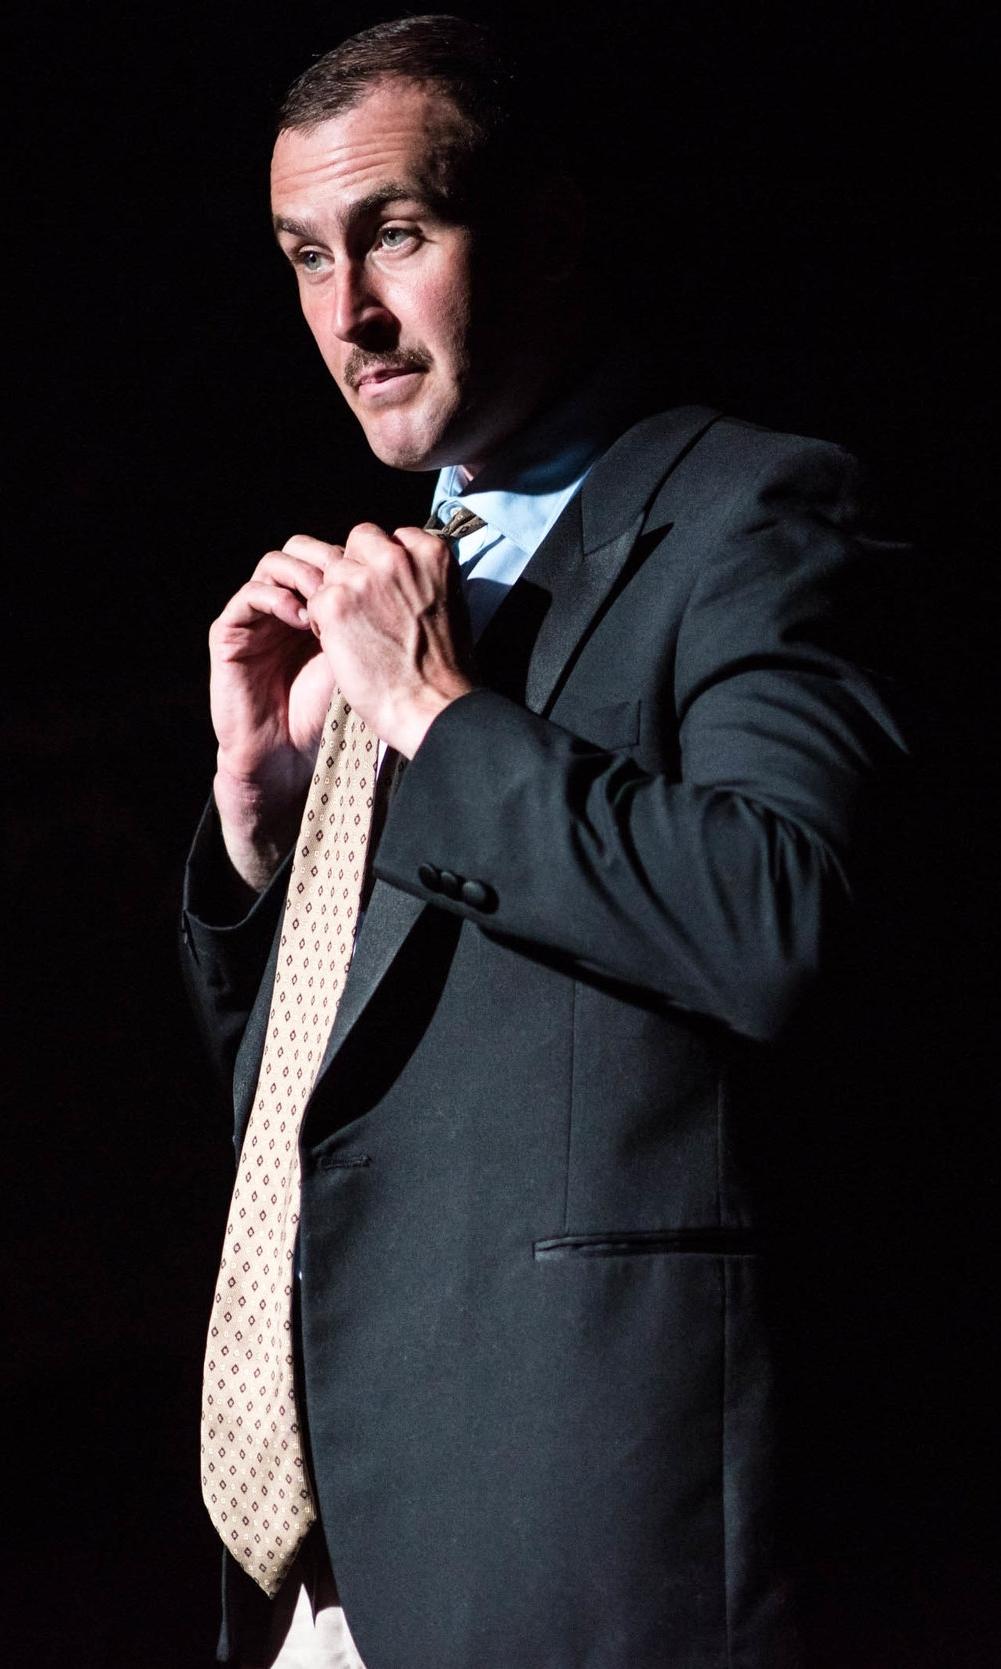 Graham Cuthbertson as Husband. Photo by Dahlia Katz